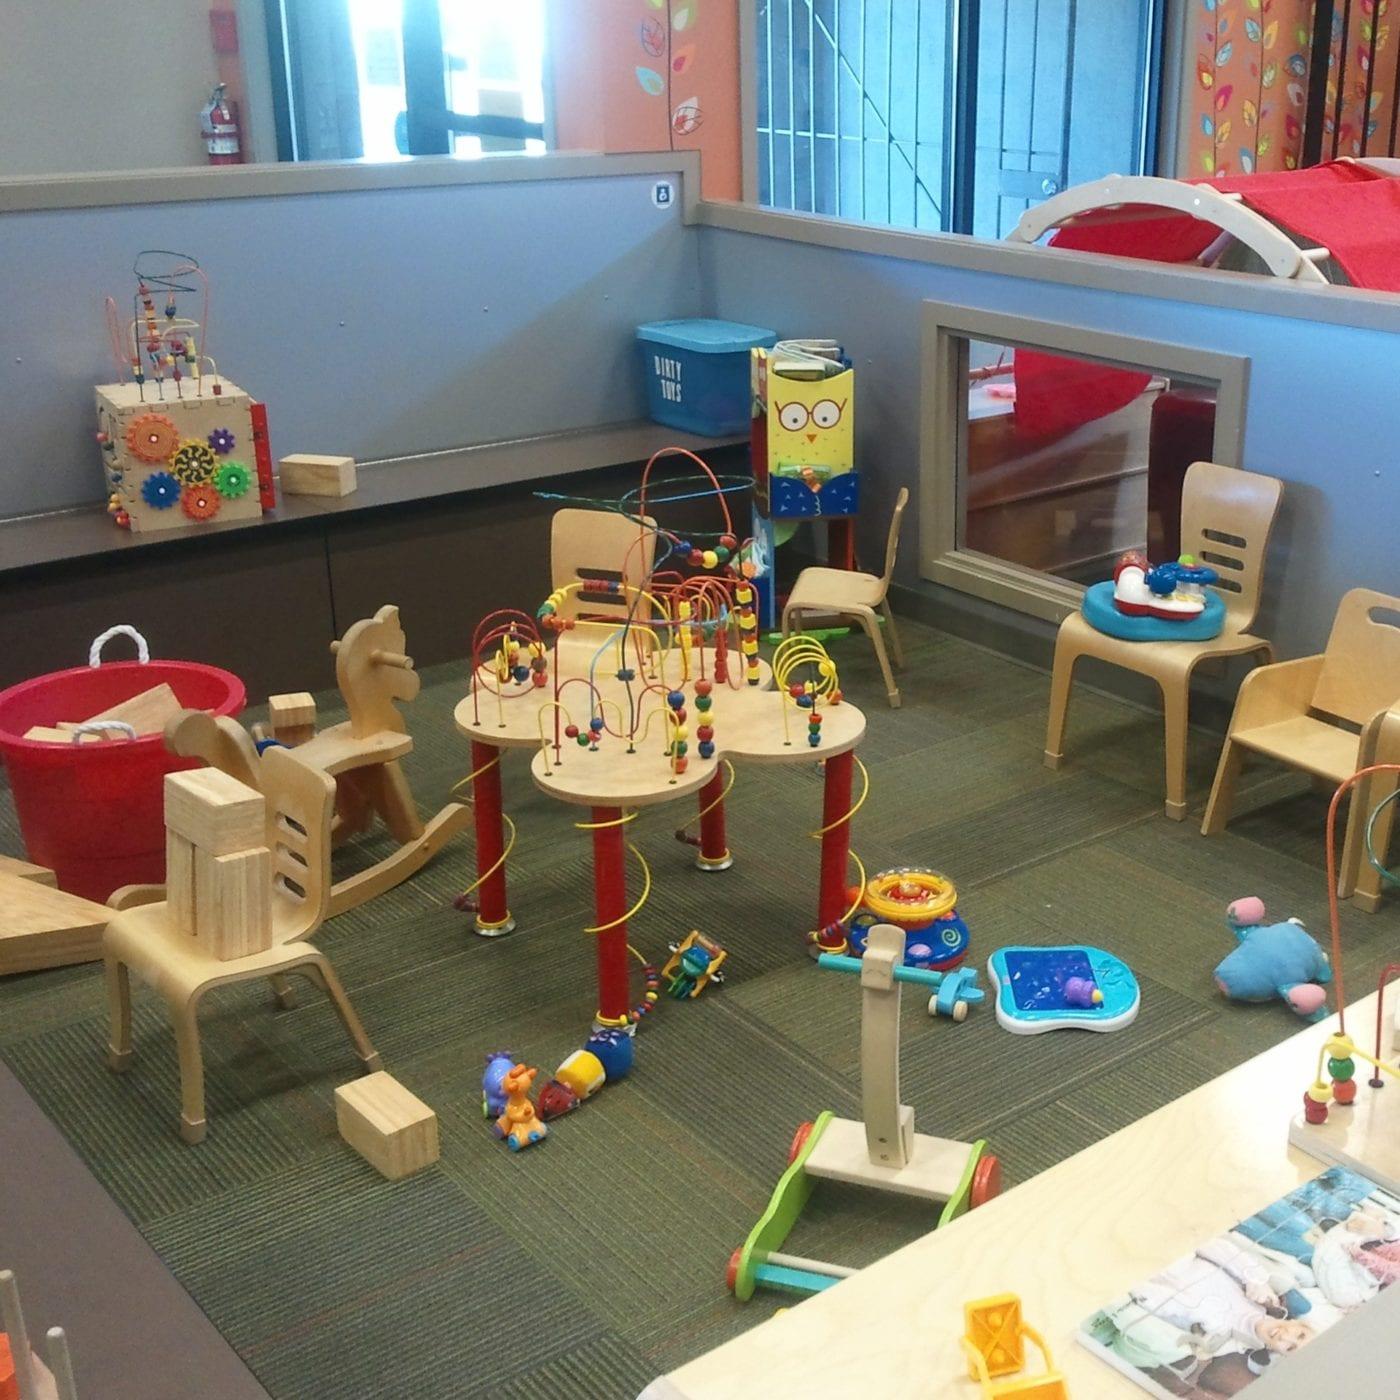 beer, wine, whatcom county, bellingham, Perch & Play, indoor playground